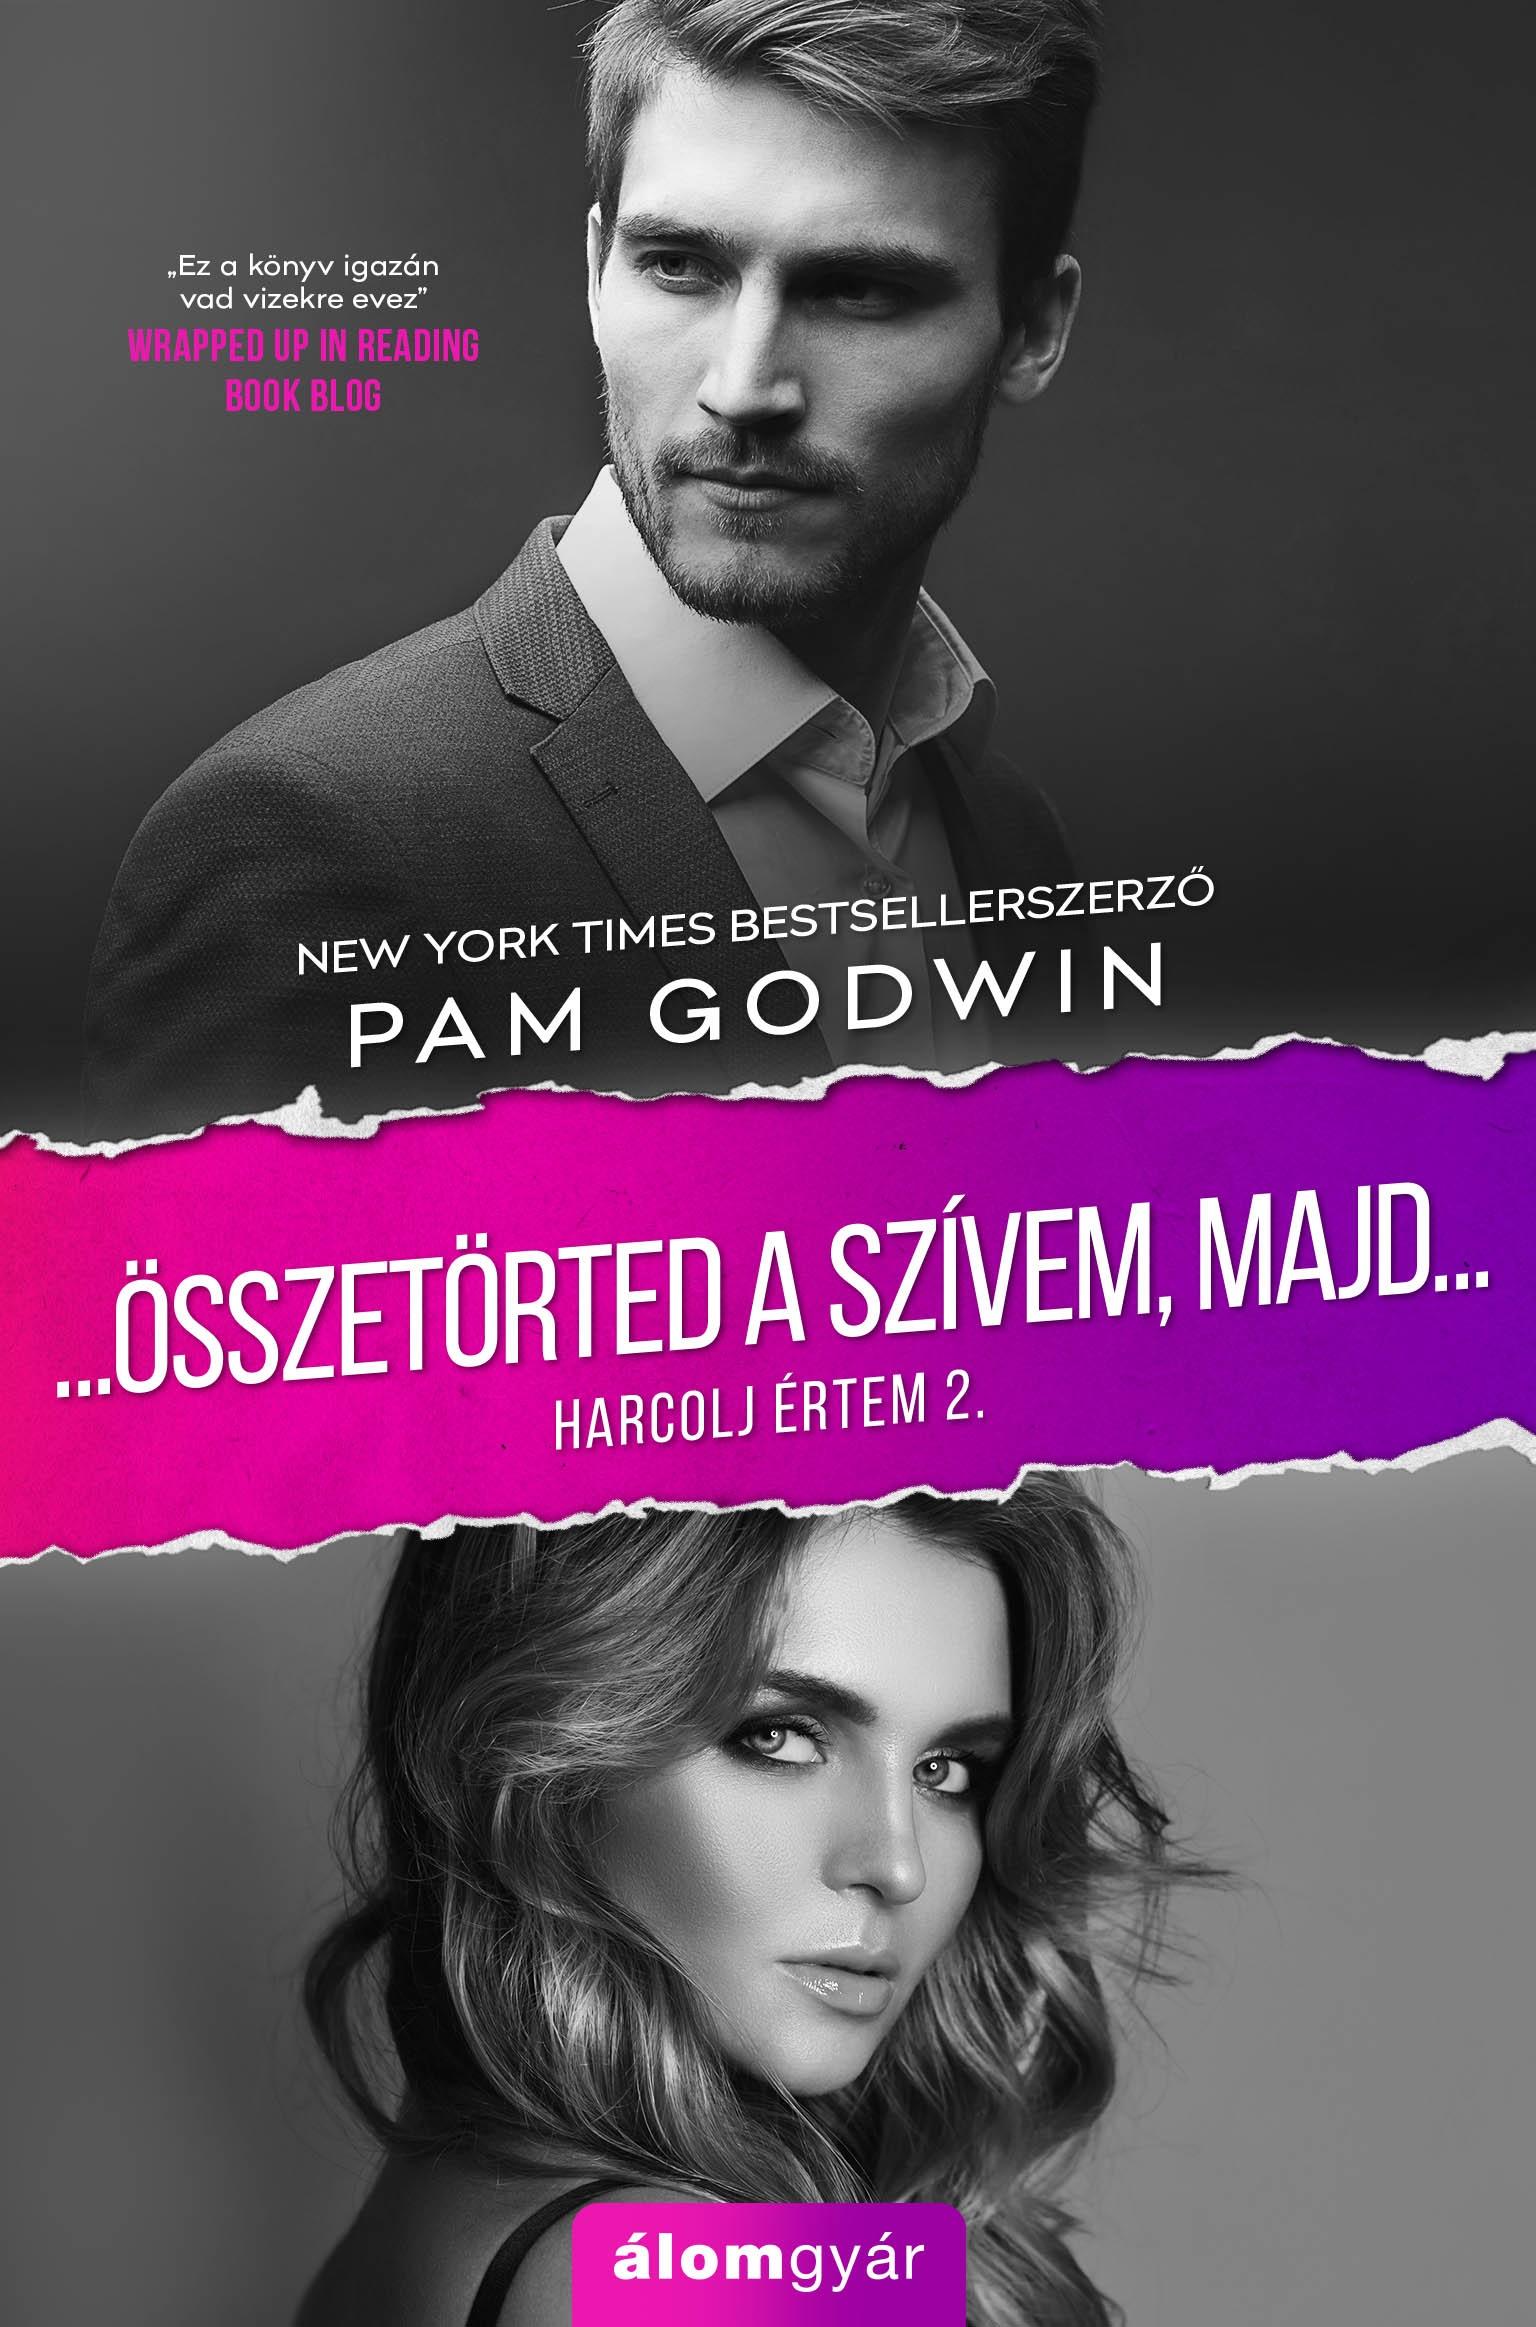 Pam Godwin - Összetörted a szívem, majd... - Harcolj értem 2.